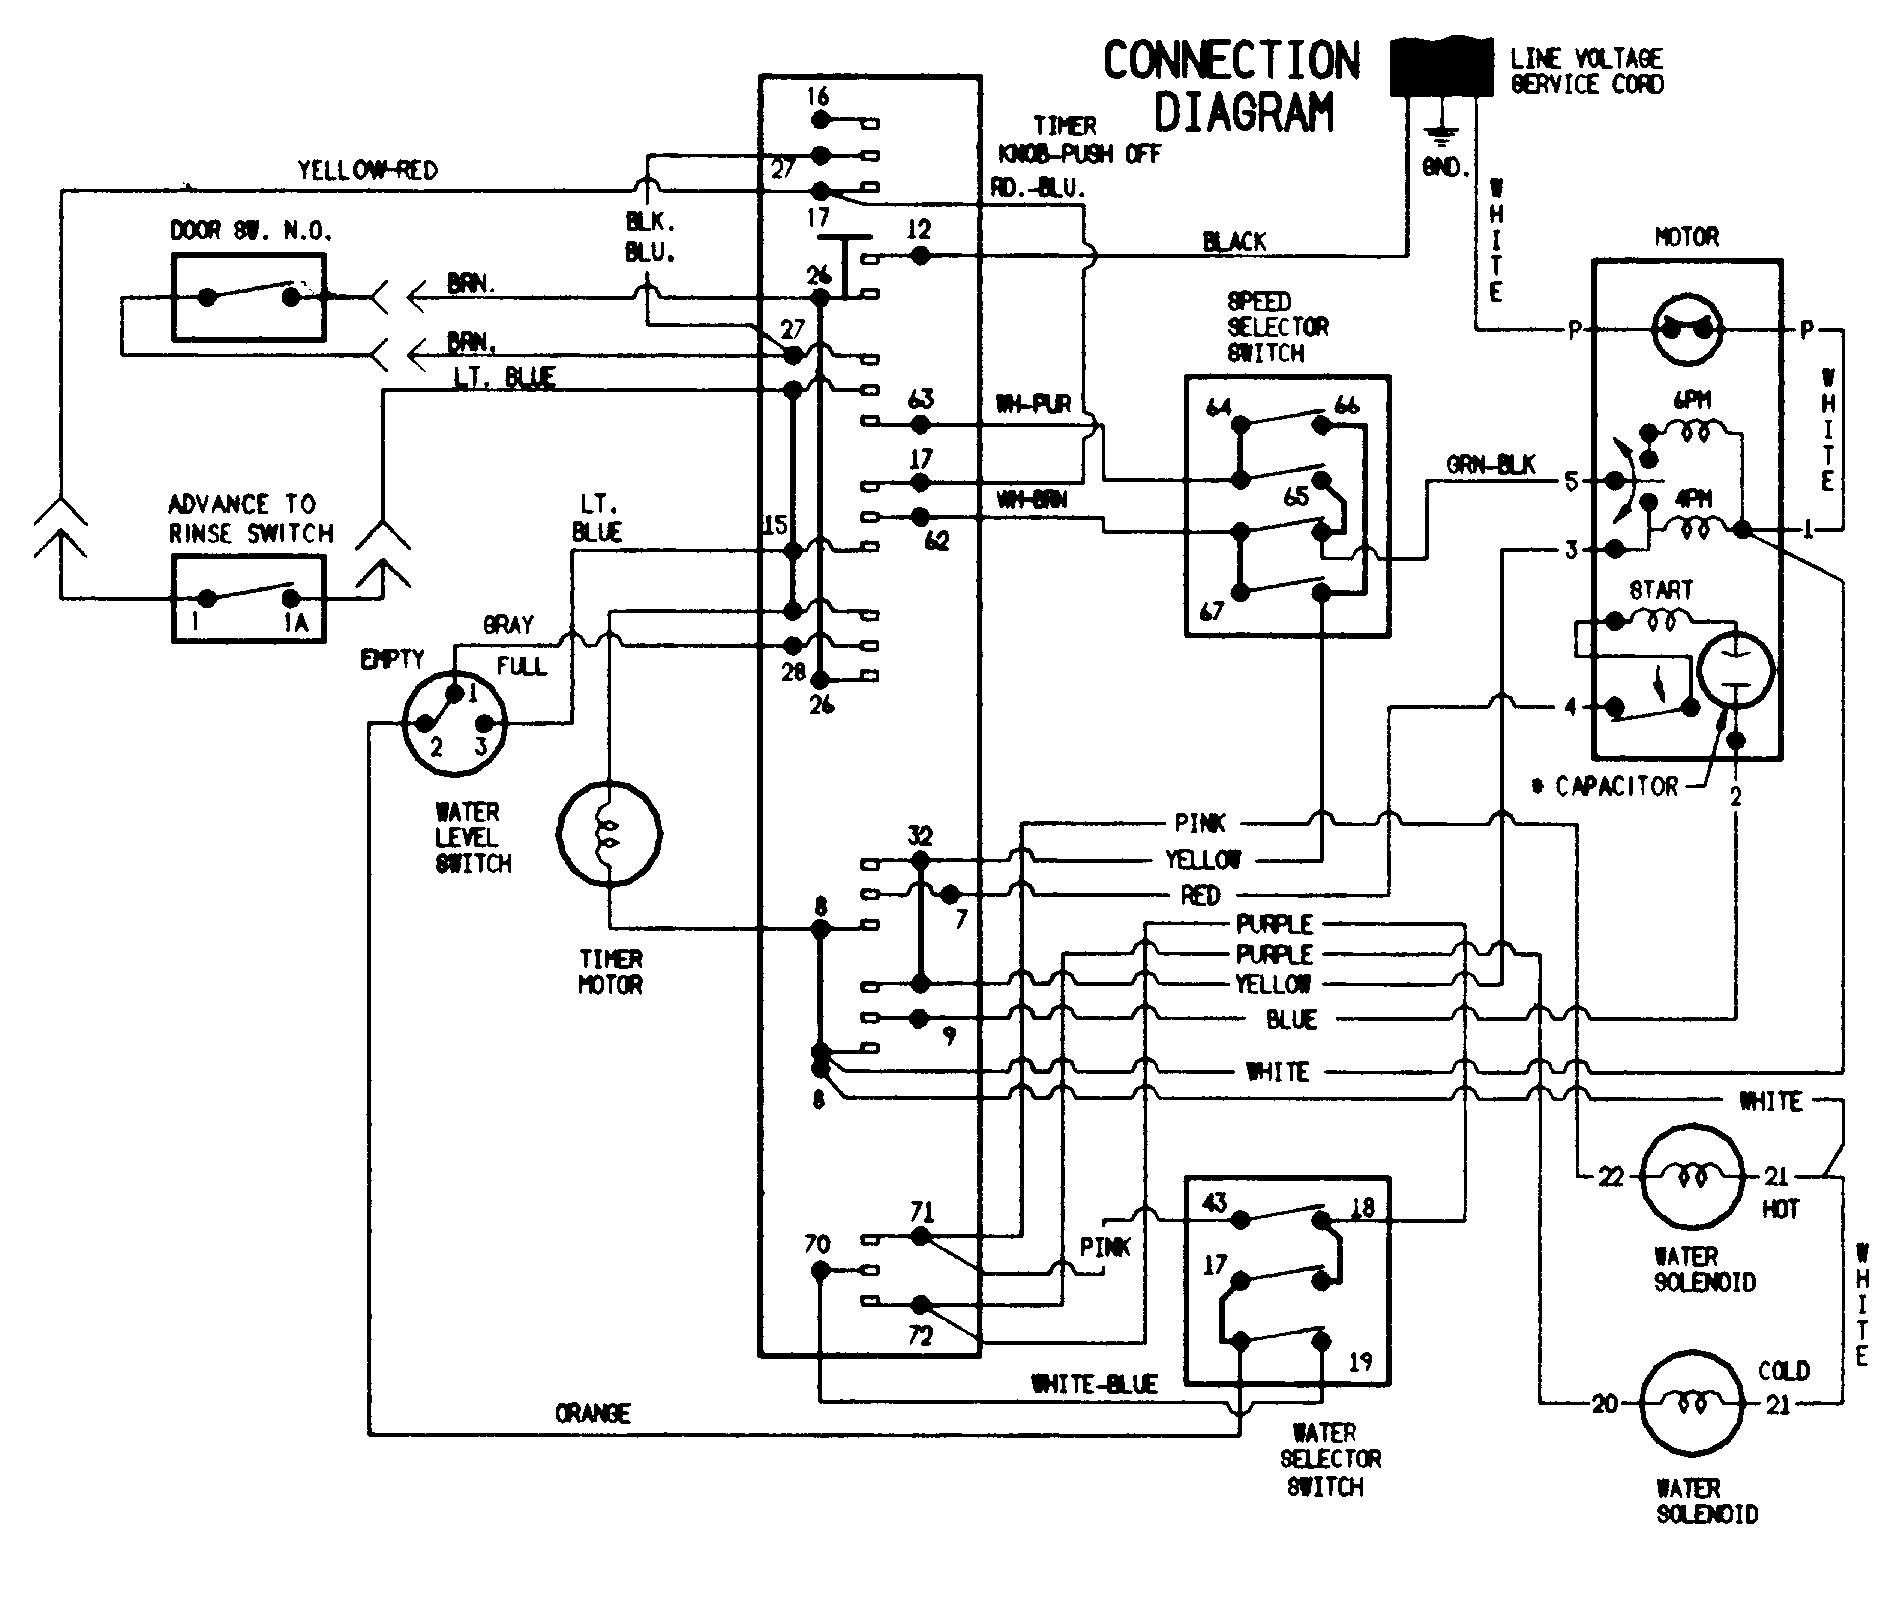 Icm Literature Wiring Diagrams Electrical Circuit Board Diagram 251 Data Base 1966 Mustang